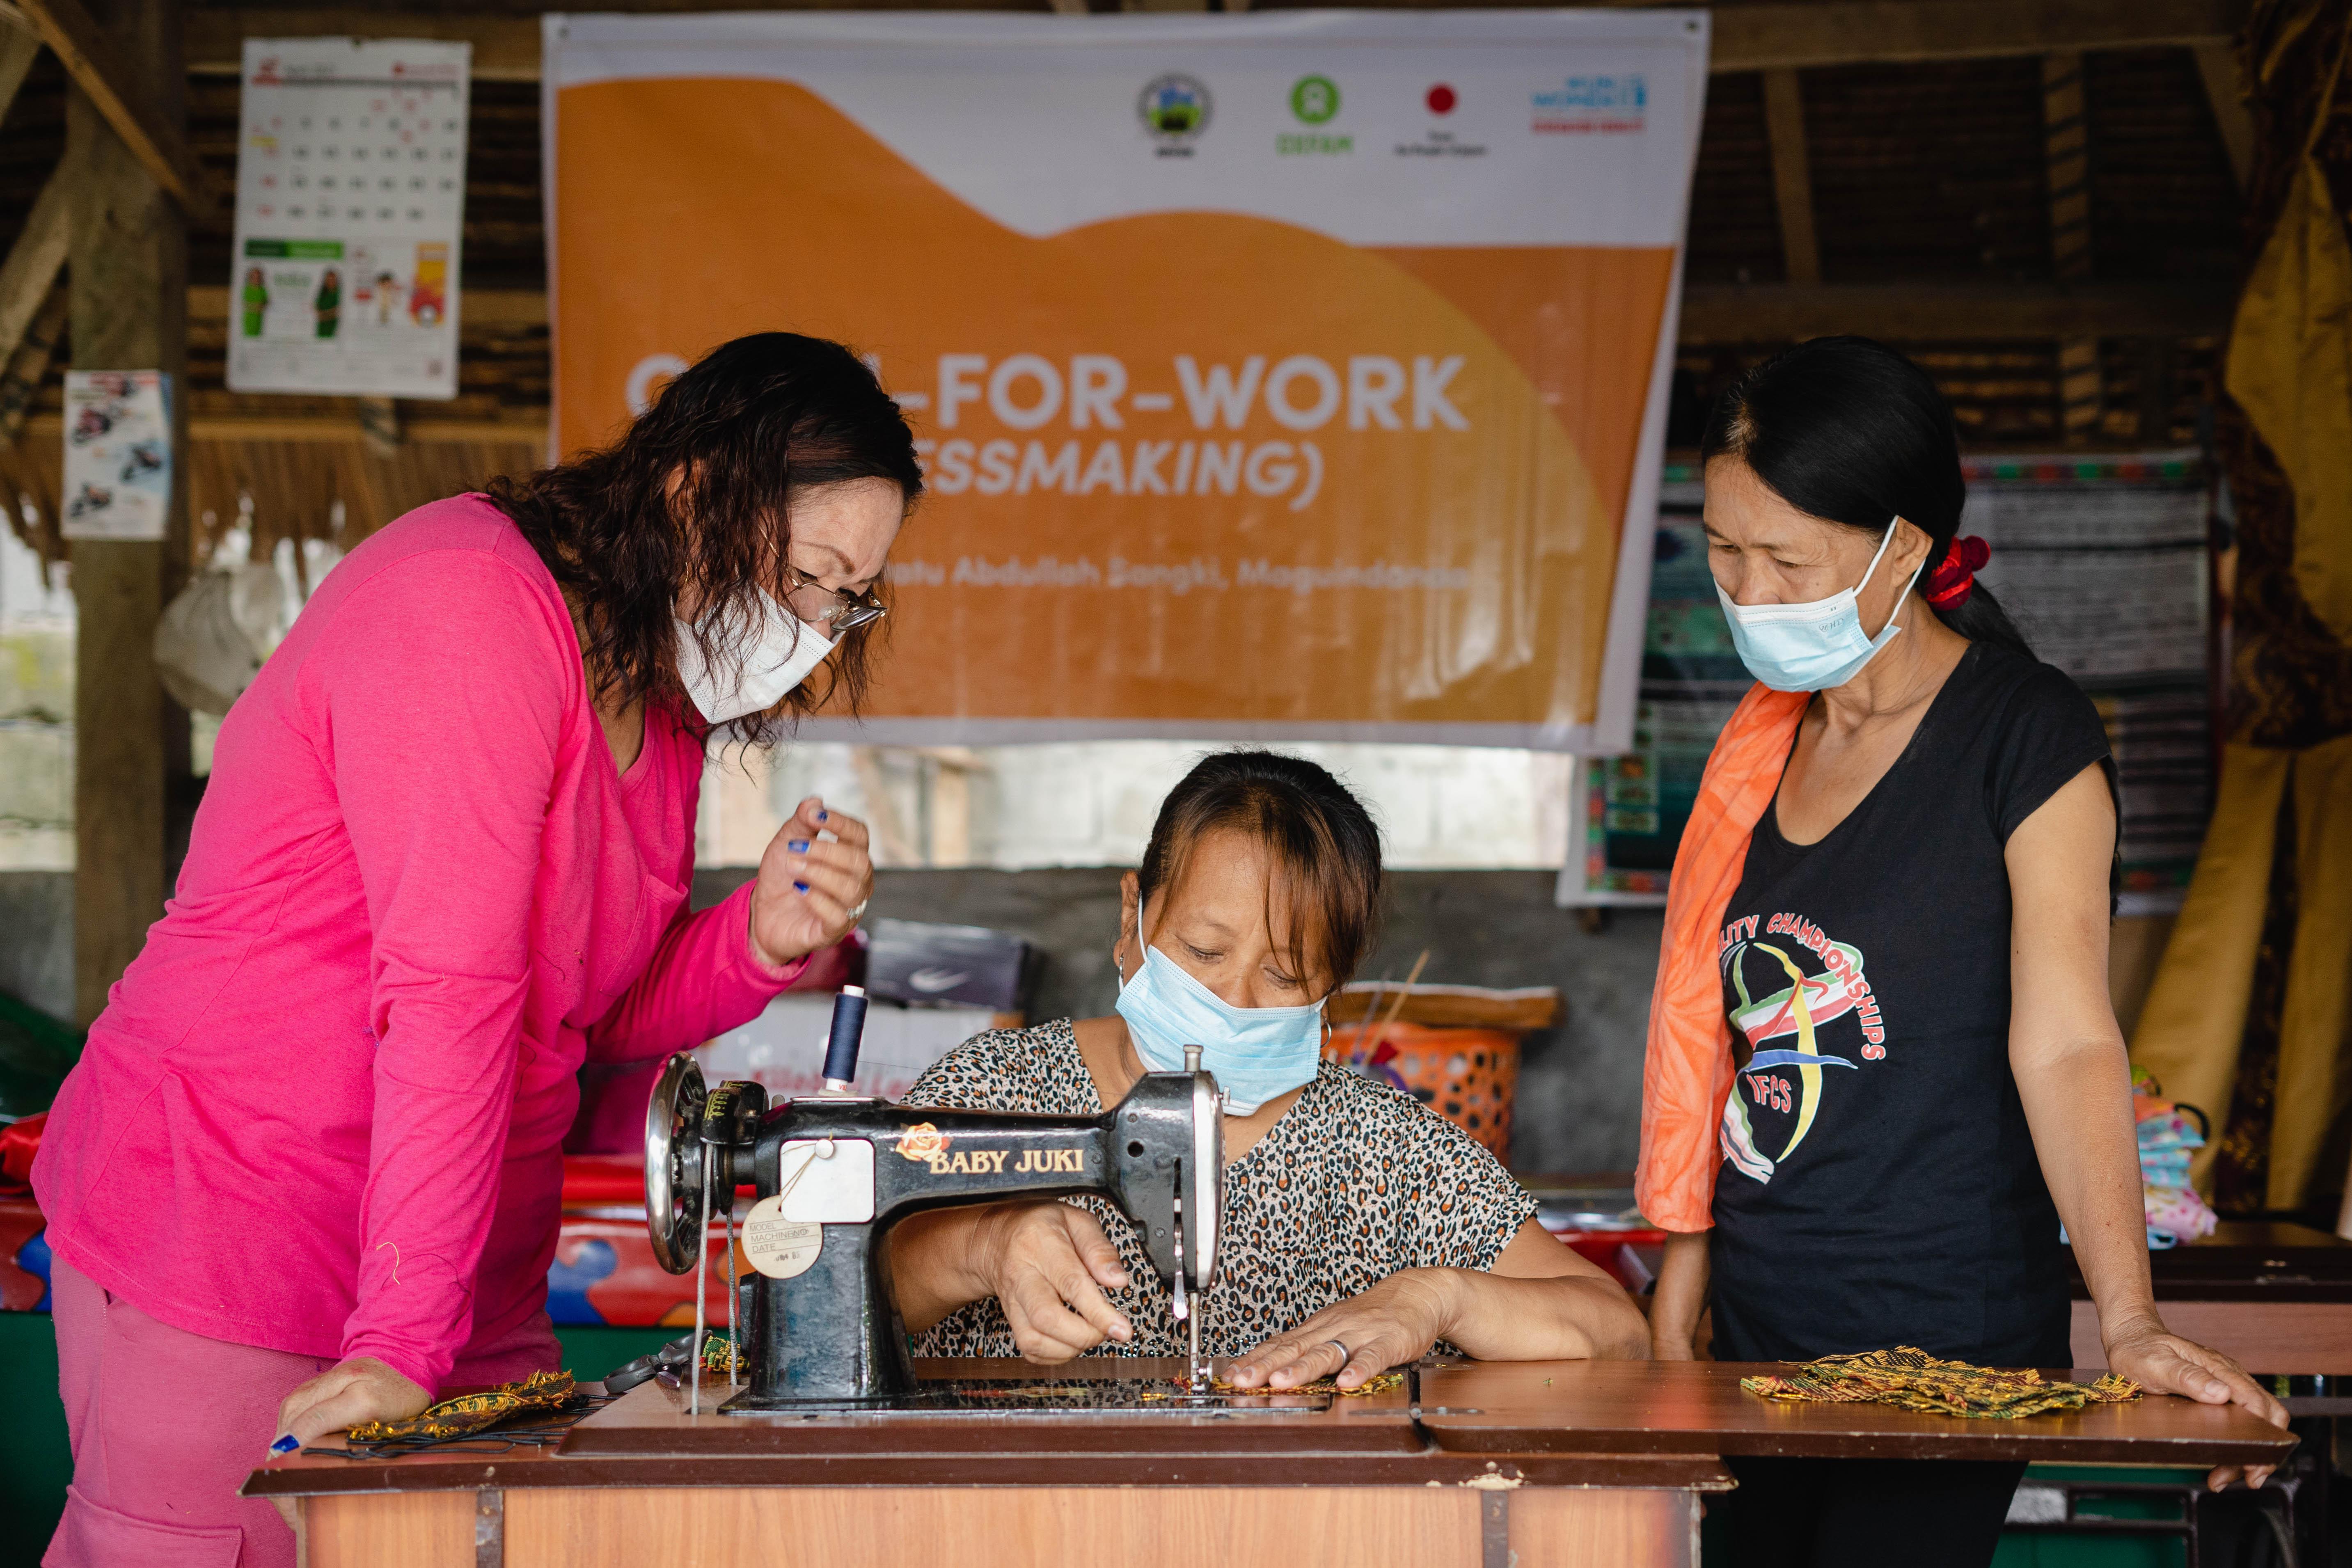 Sarah Dilangalen, Women's Federation President of Datu Abdullah Sangki, Maguindanao supervises two women on sewing Inaul face masks.